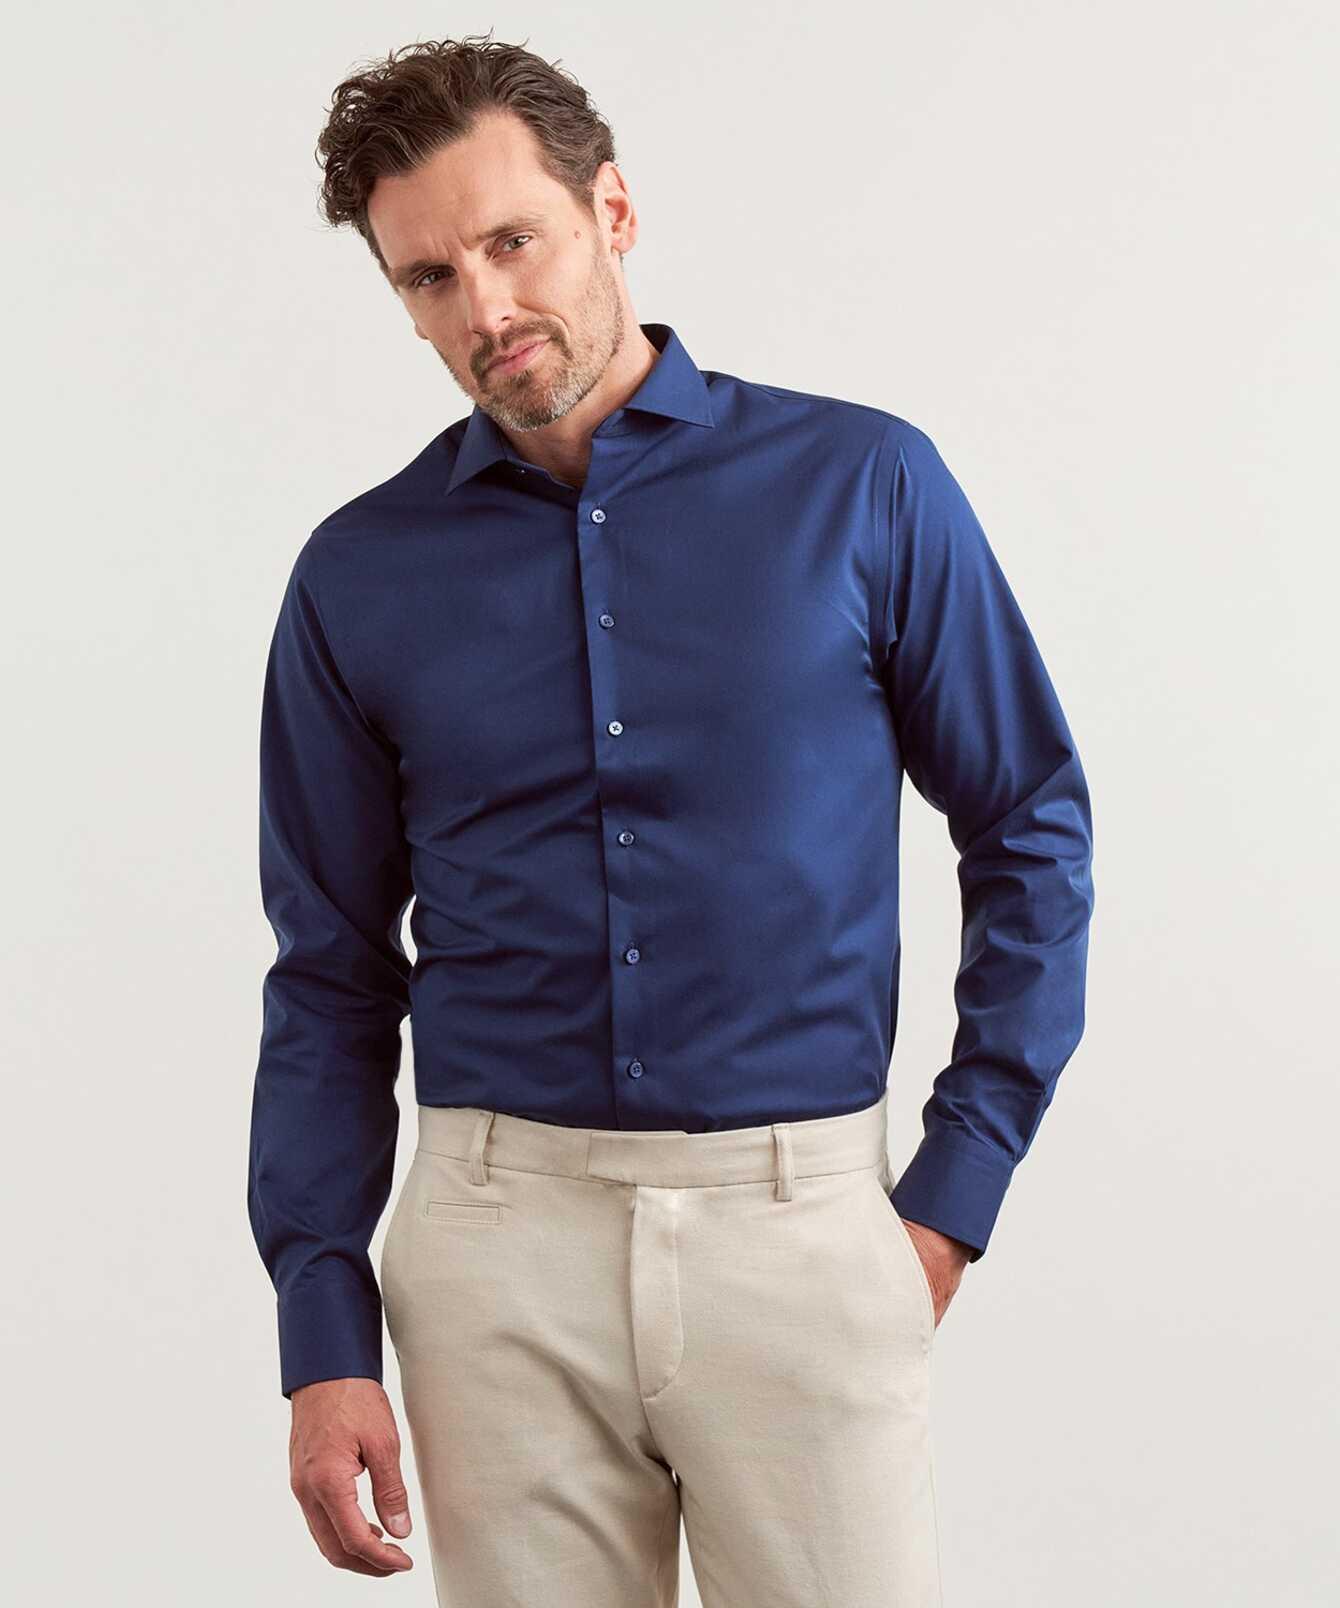 Shirt Grand Twill Strykfri Mörkblå Extra Lång Ärm The Shirt Factory